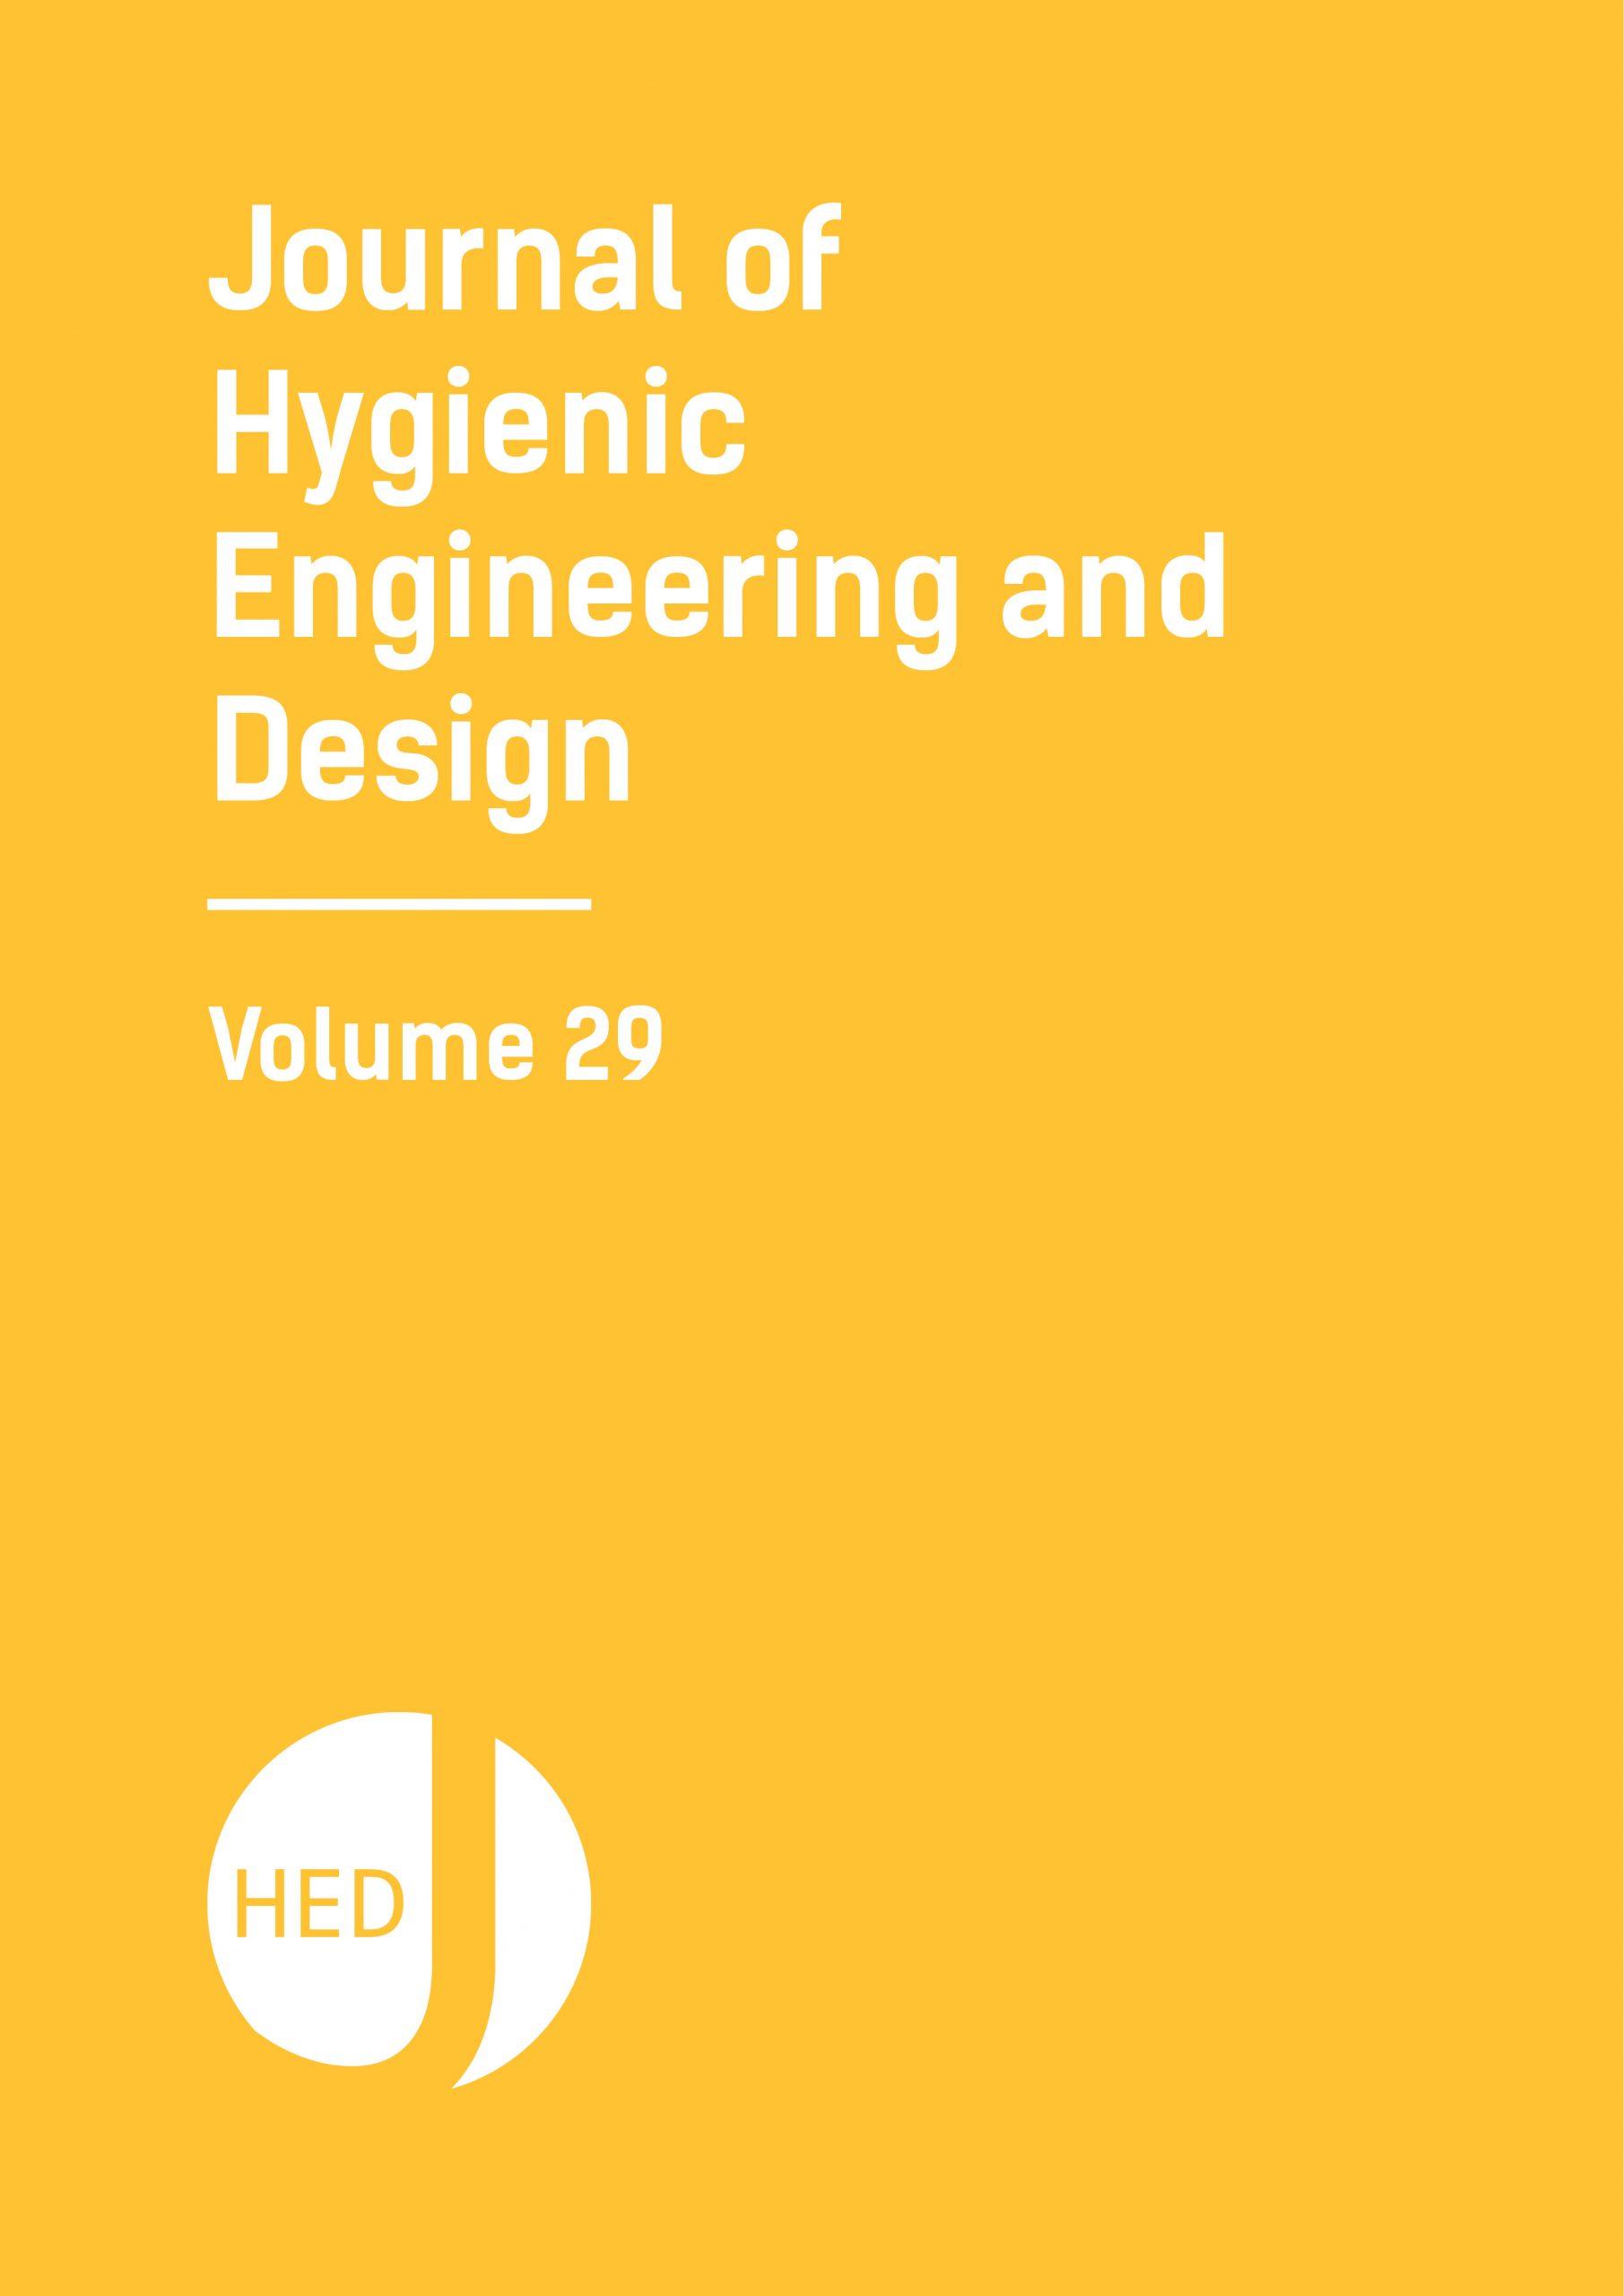 JHED Volume 29